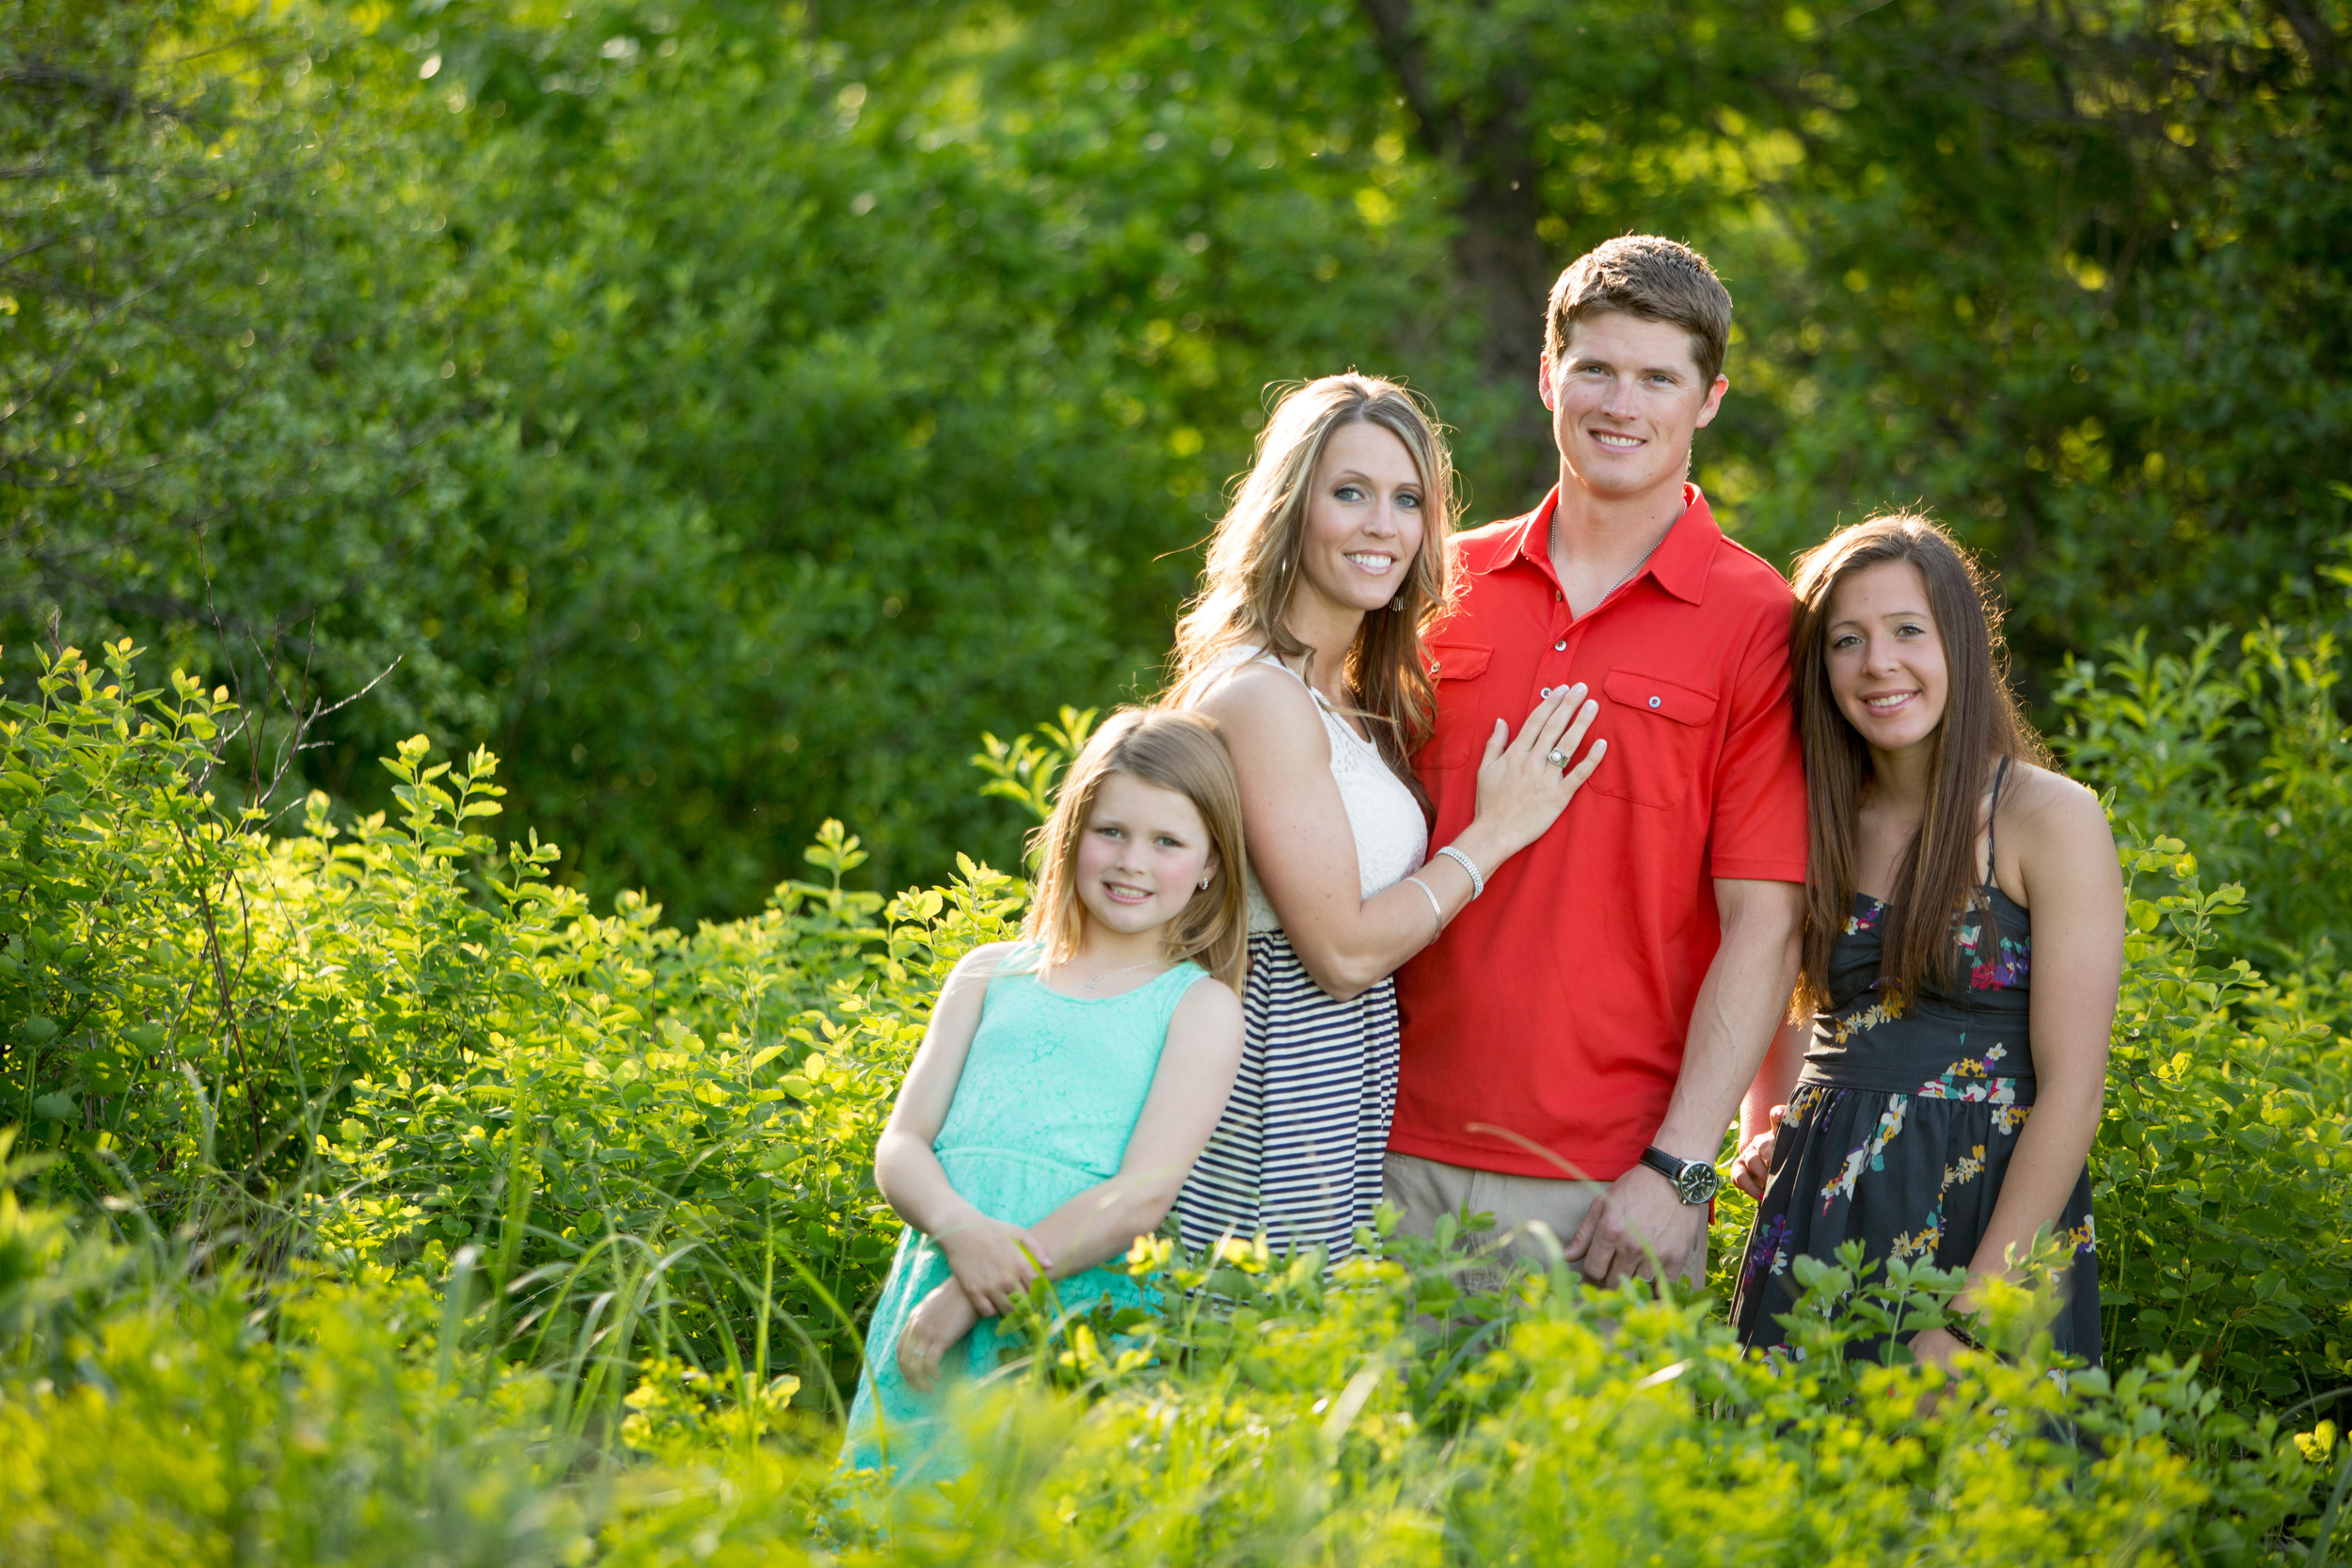 family_portrait_sioux_falls_Shalista0021.jpg